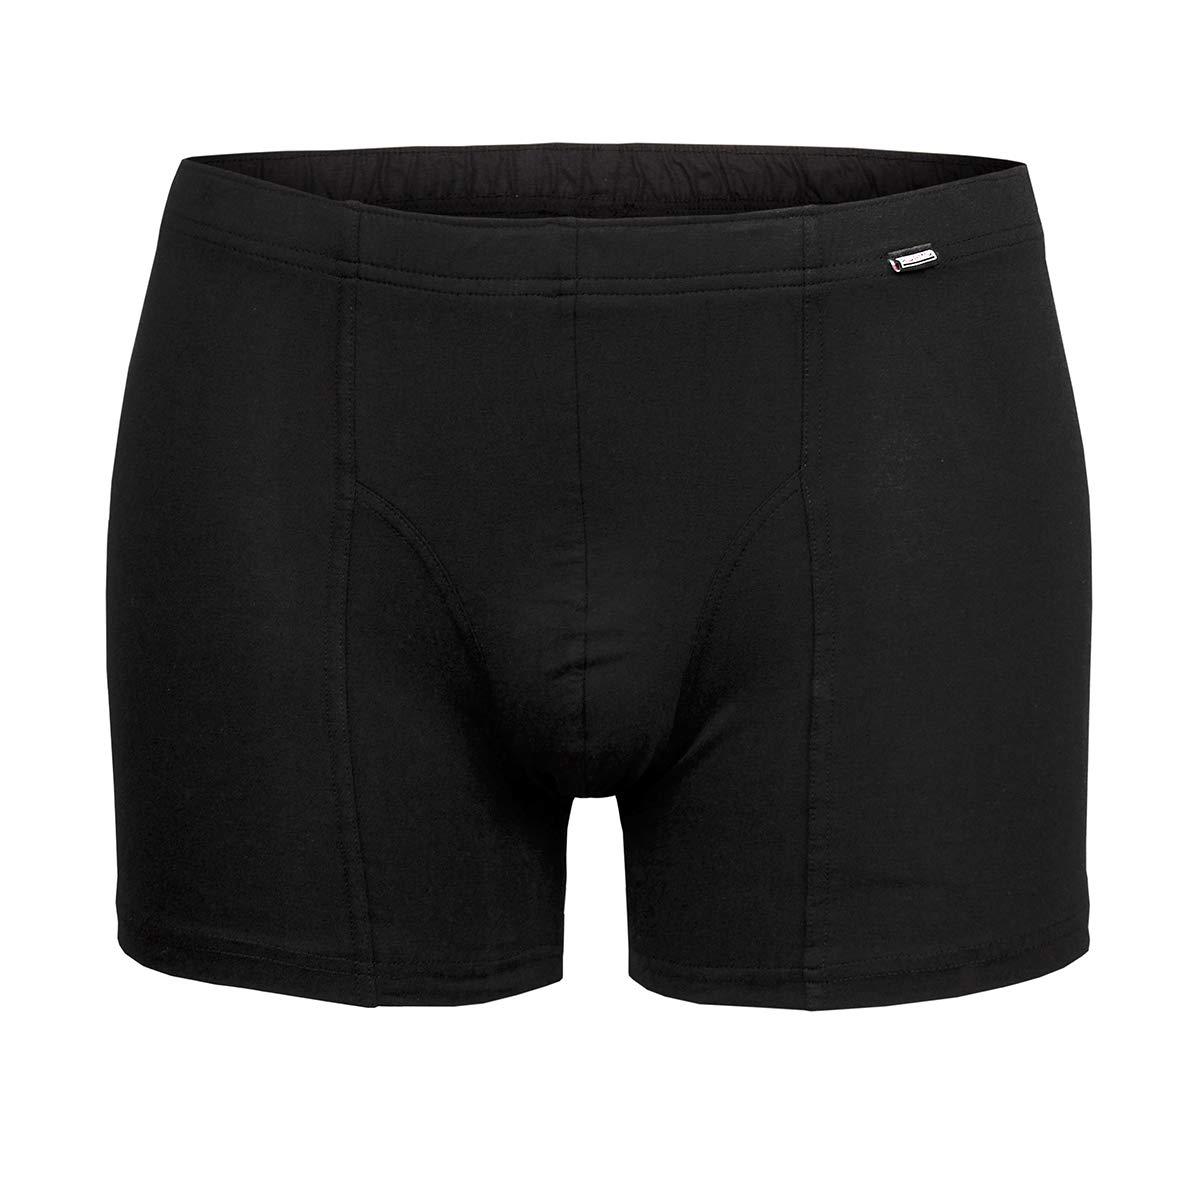 Twin pack Jack Maxipant nero da Adamo oversize moda